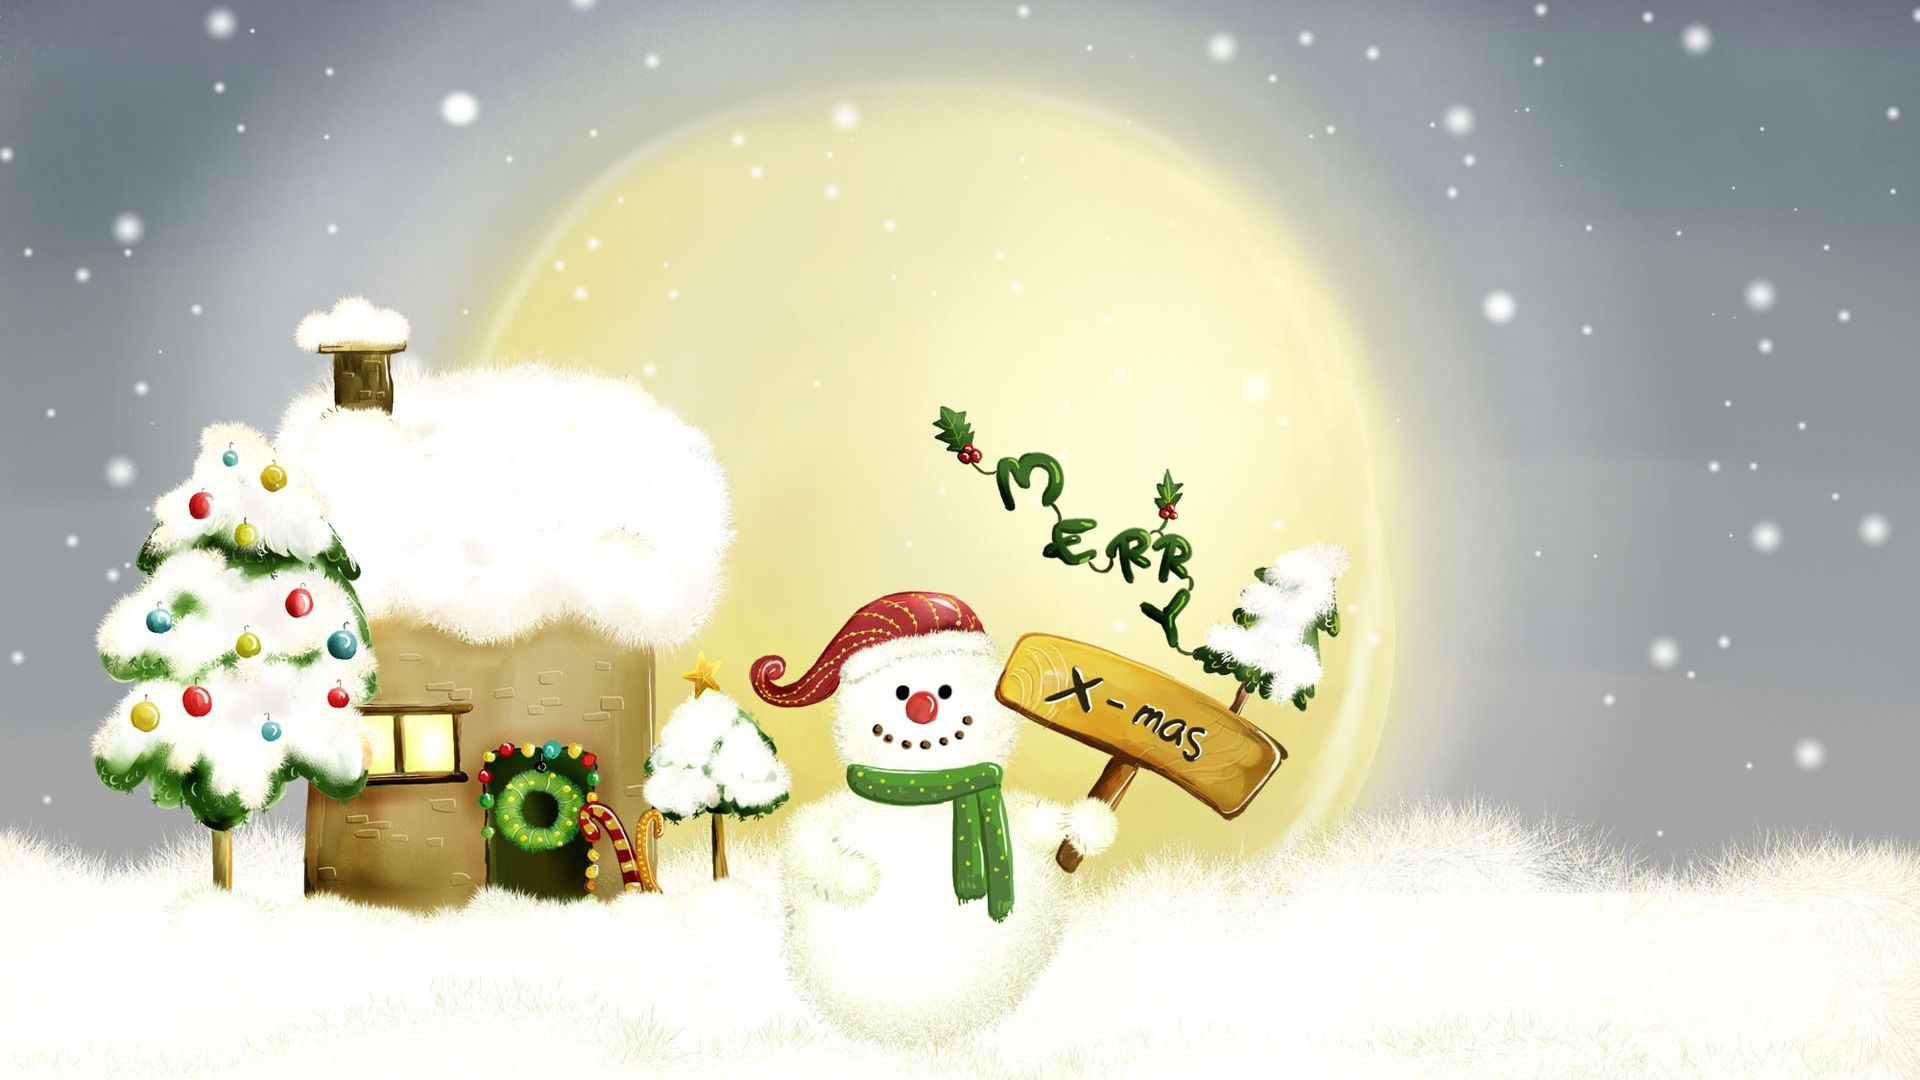 Pin von Merry Christmas Wishes 2u auf Merry Christmas Wishes | Pinterest